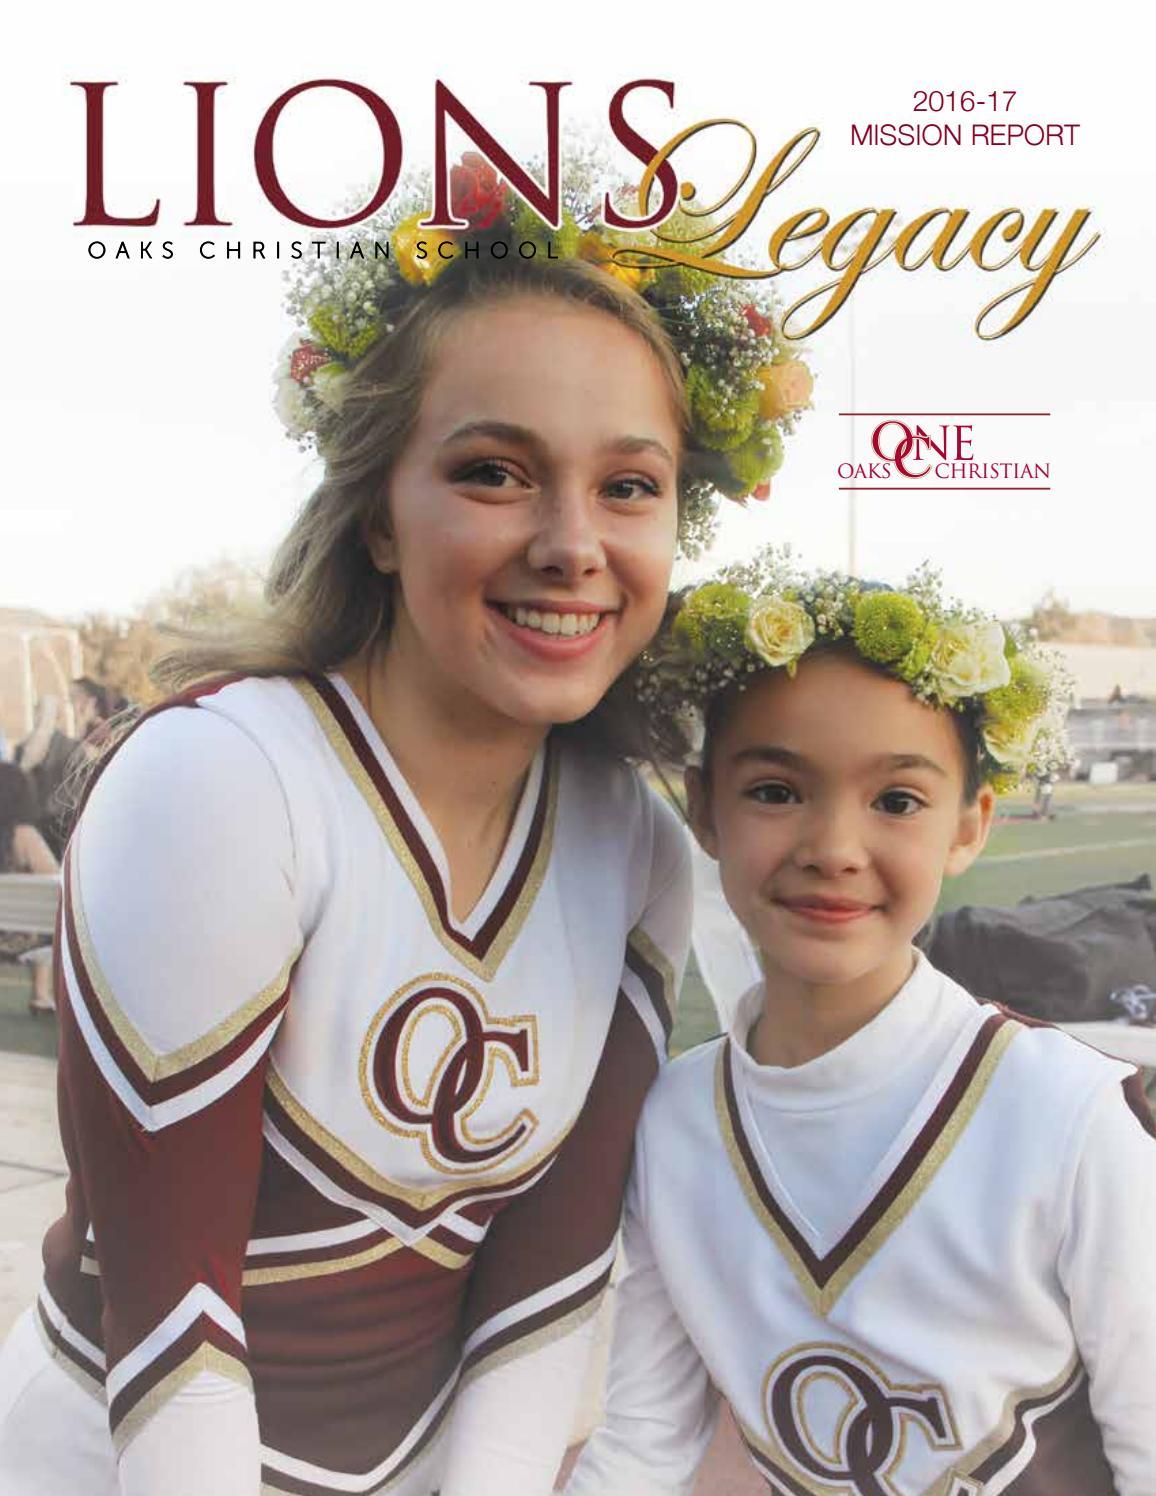 Oc Mission Report 2016 2017 By Oaks Christian School Issuu